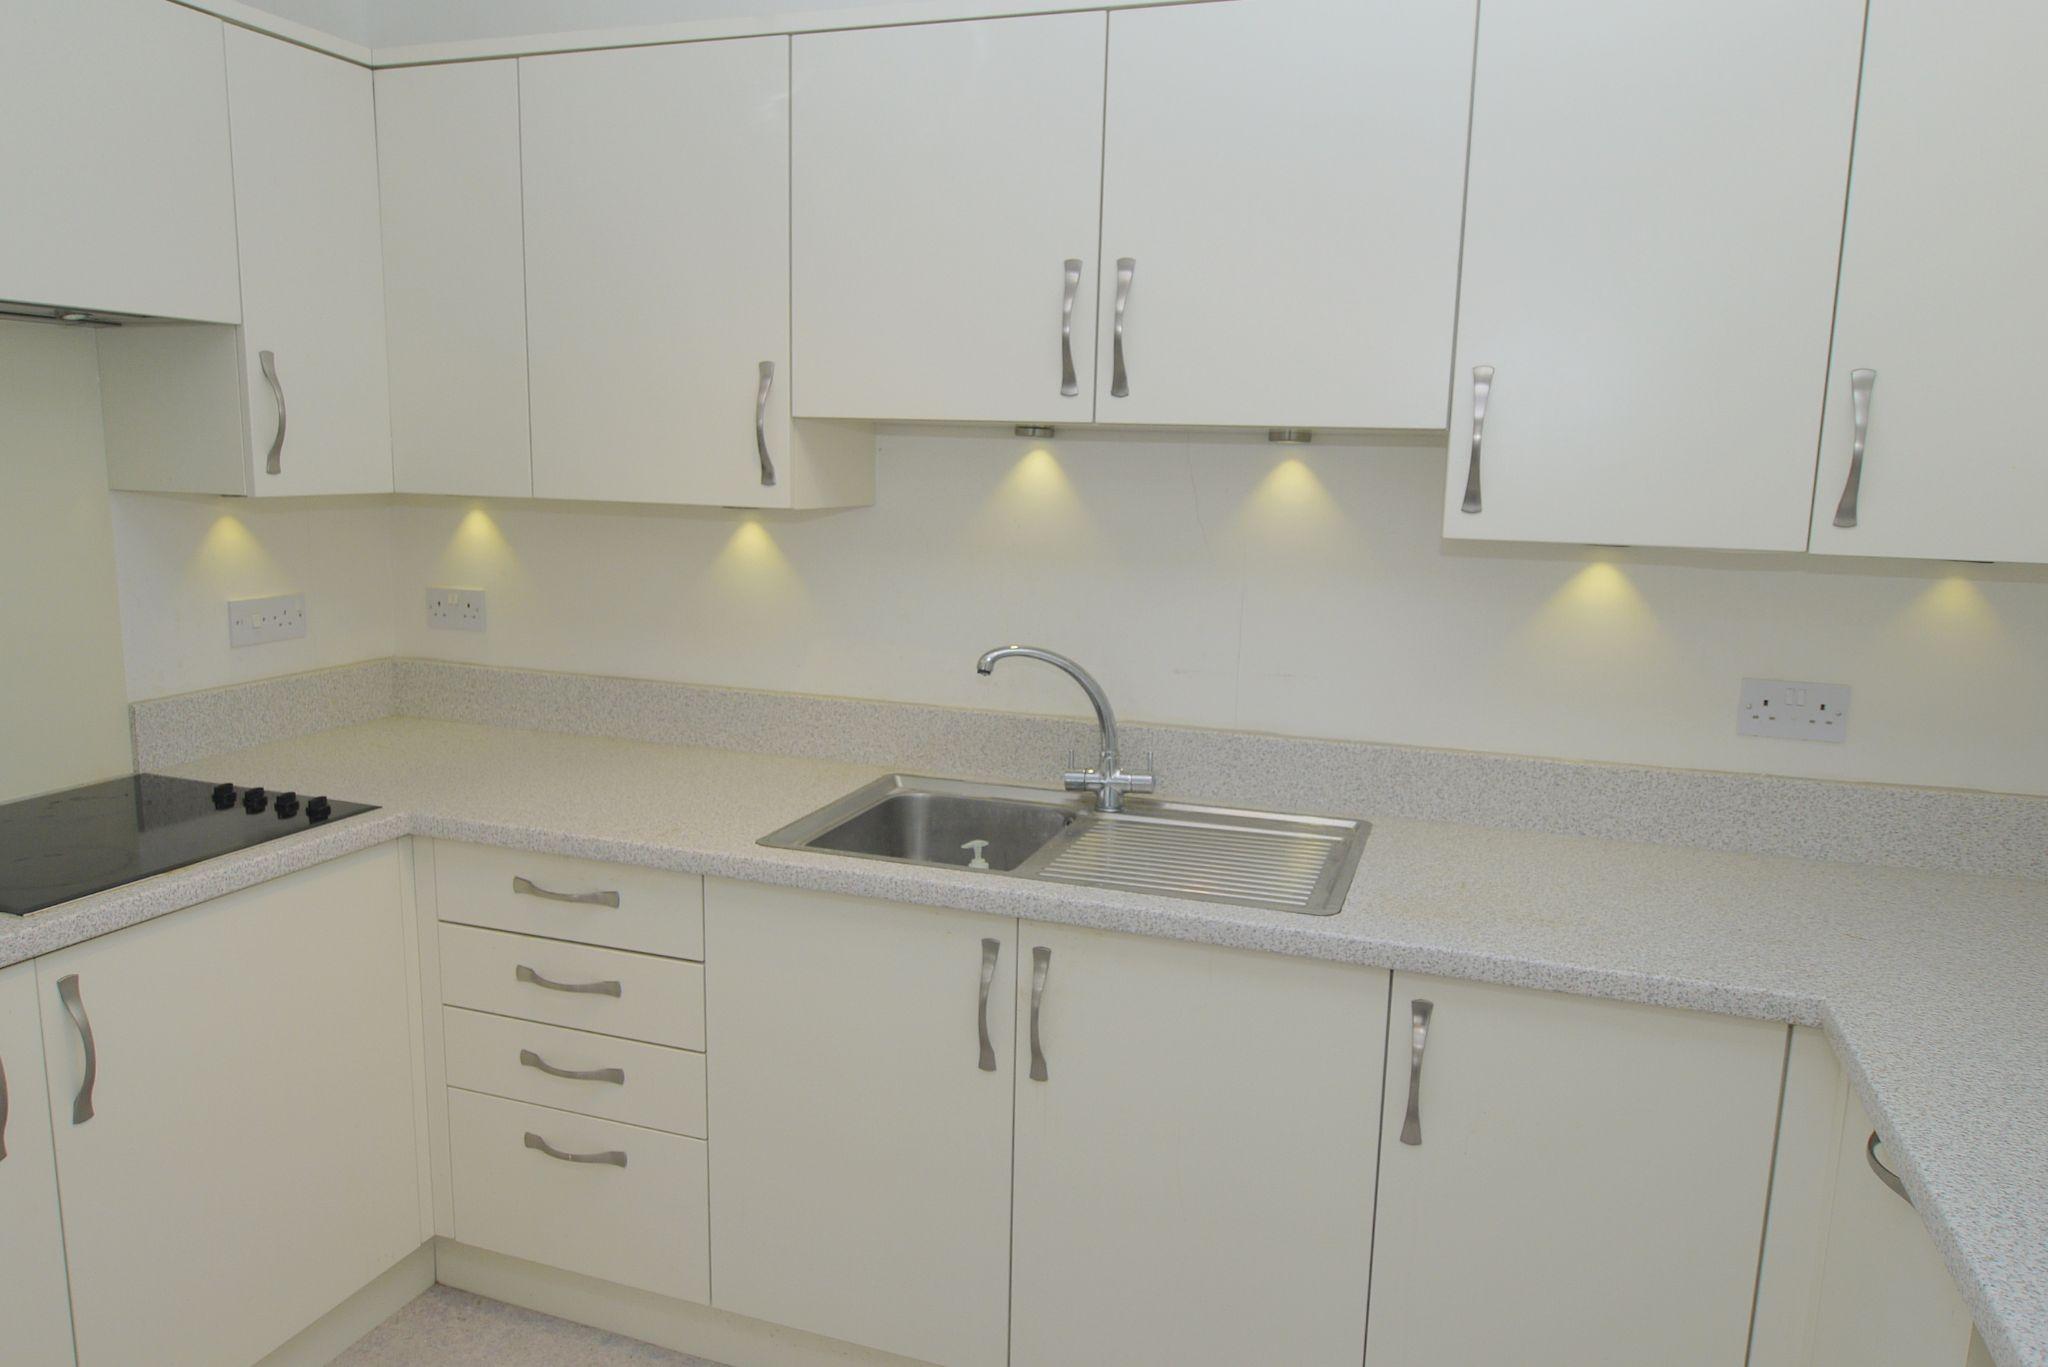 1 bedroom apartment For Sale in Sevenoaks - Photograph 3